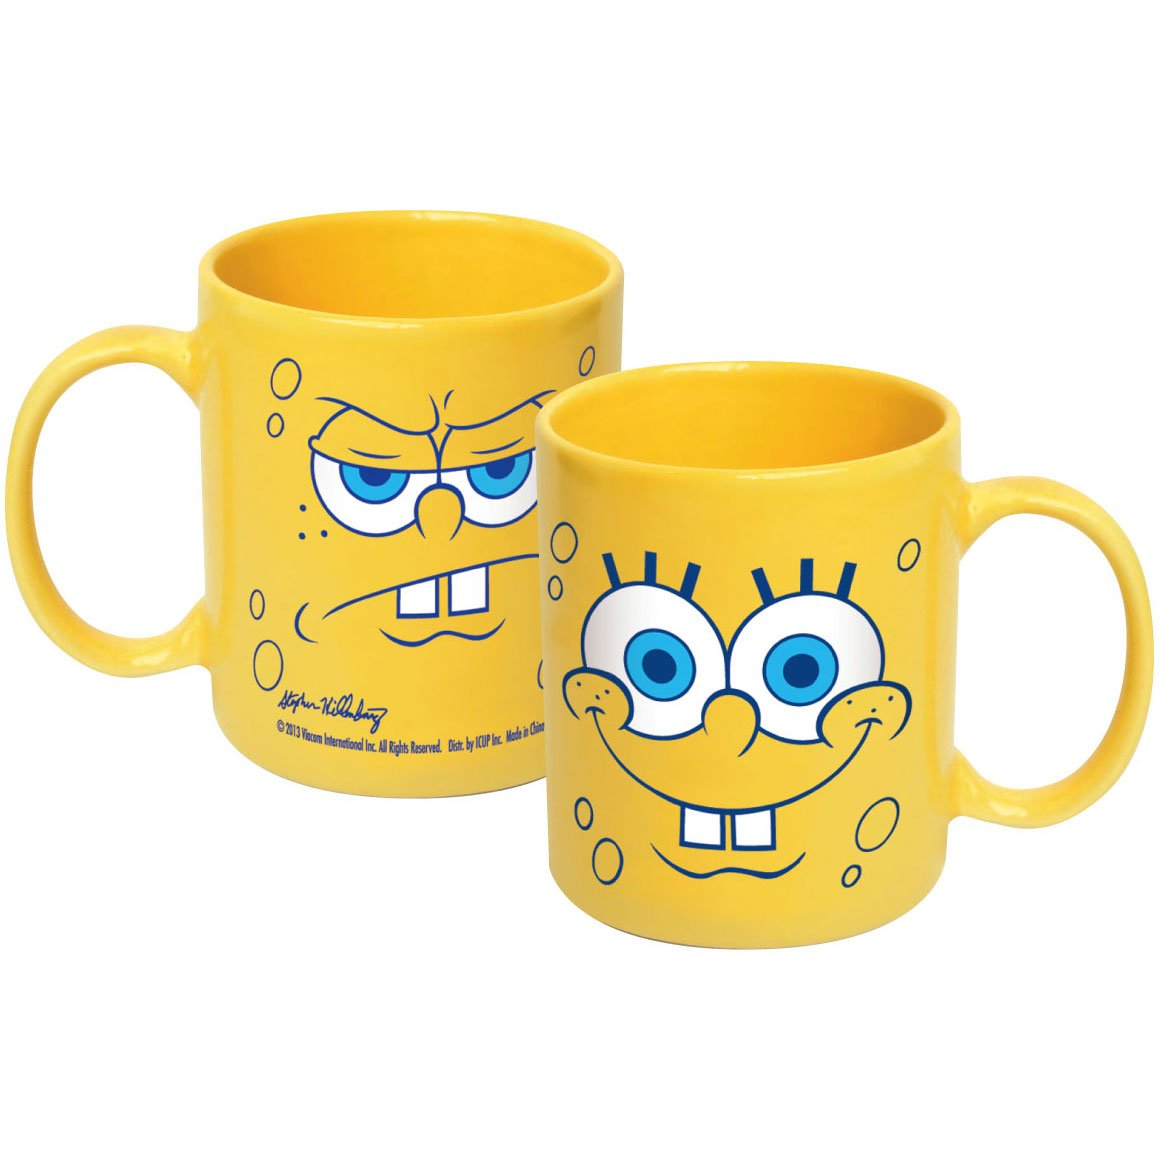 ICUP Spongebob Big Faces Ceramic Mug, 20 oz, Clear